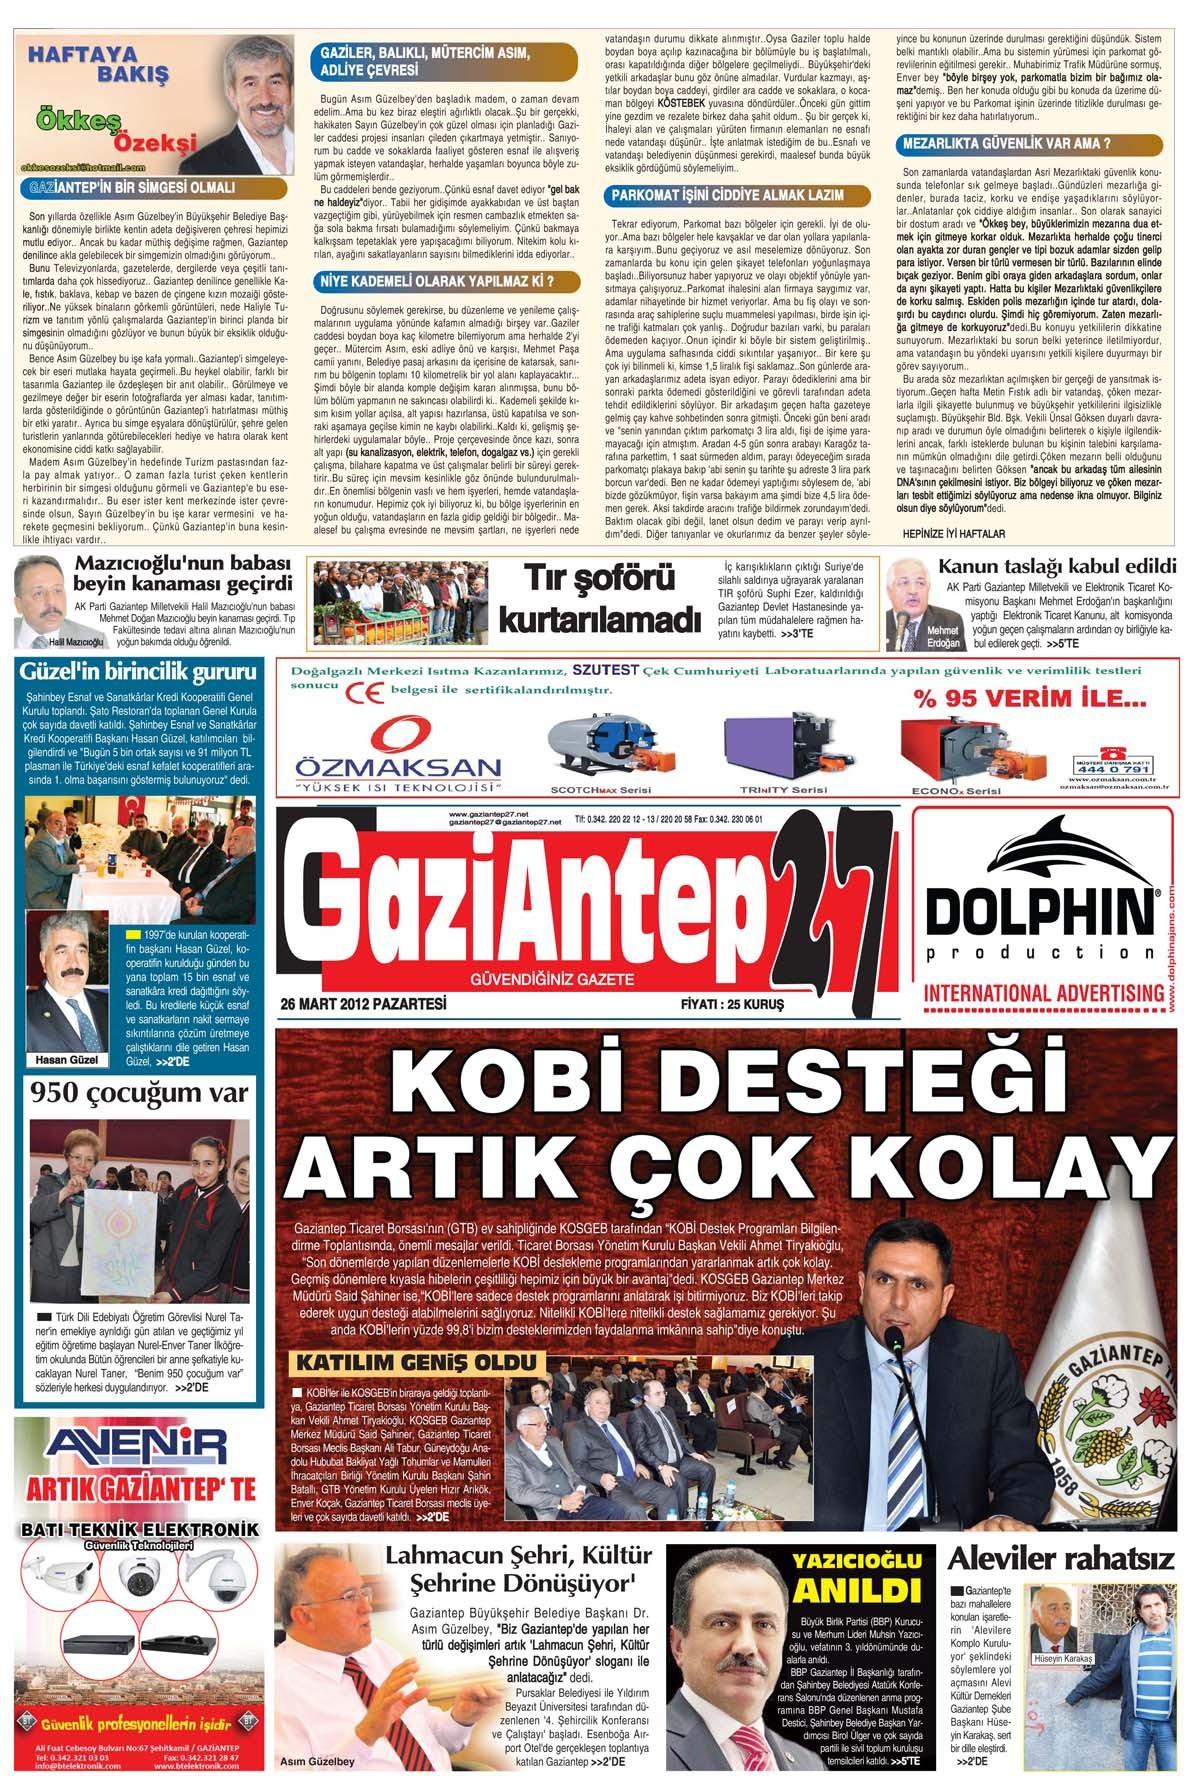 27 Aralık 2013 Tarihli e-Gazete 1